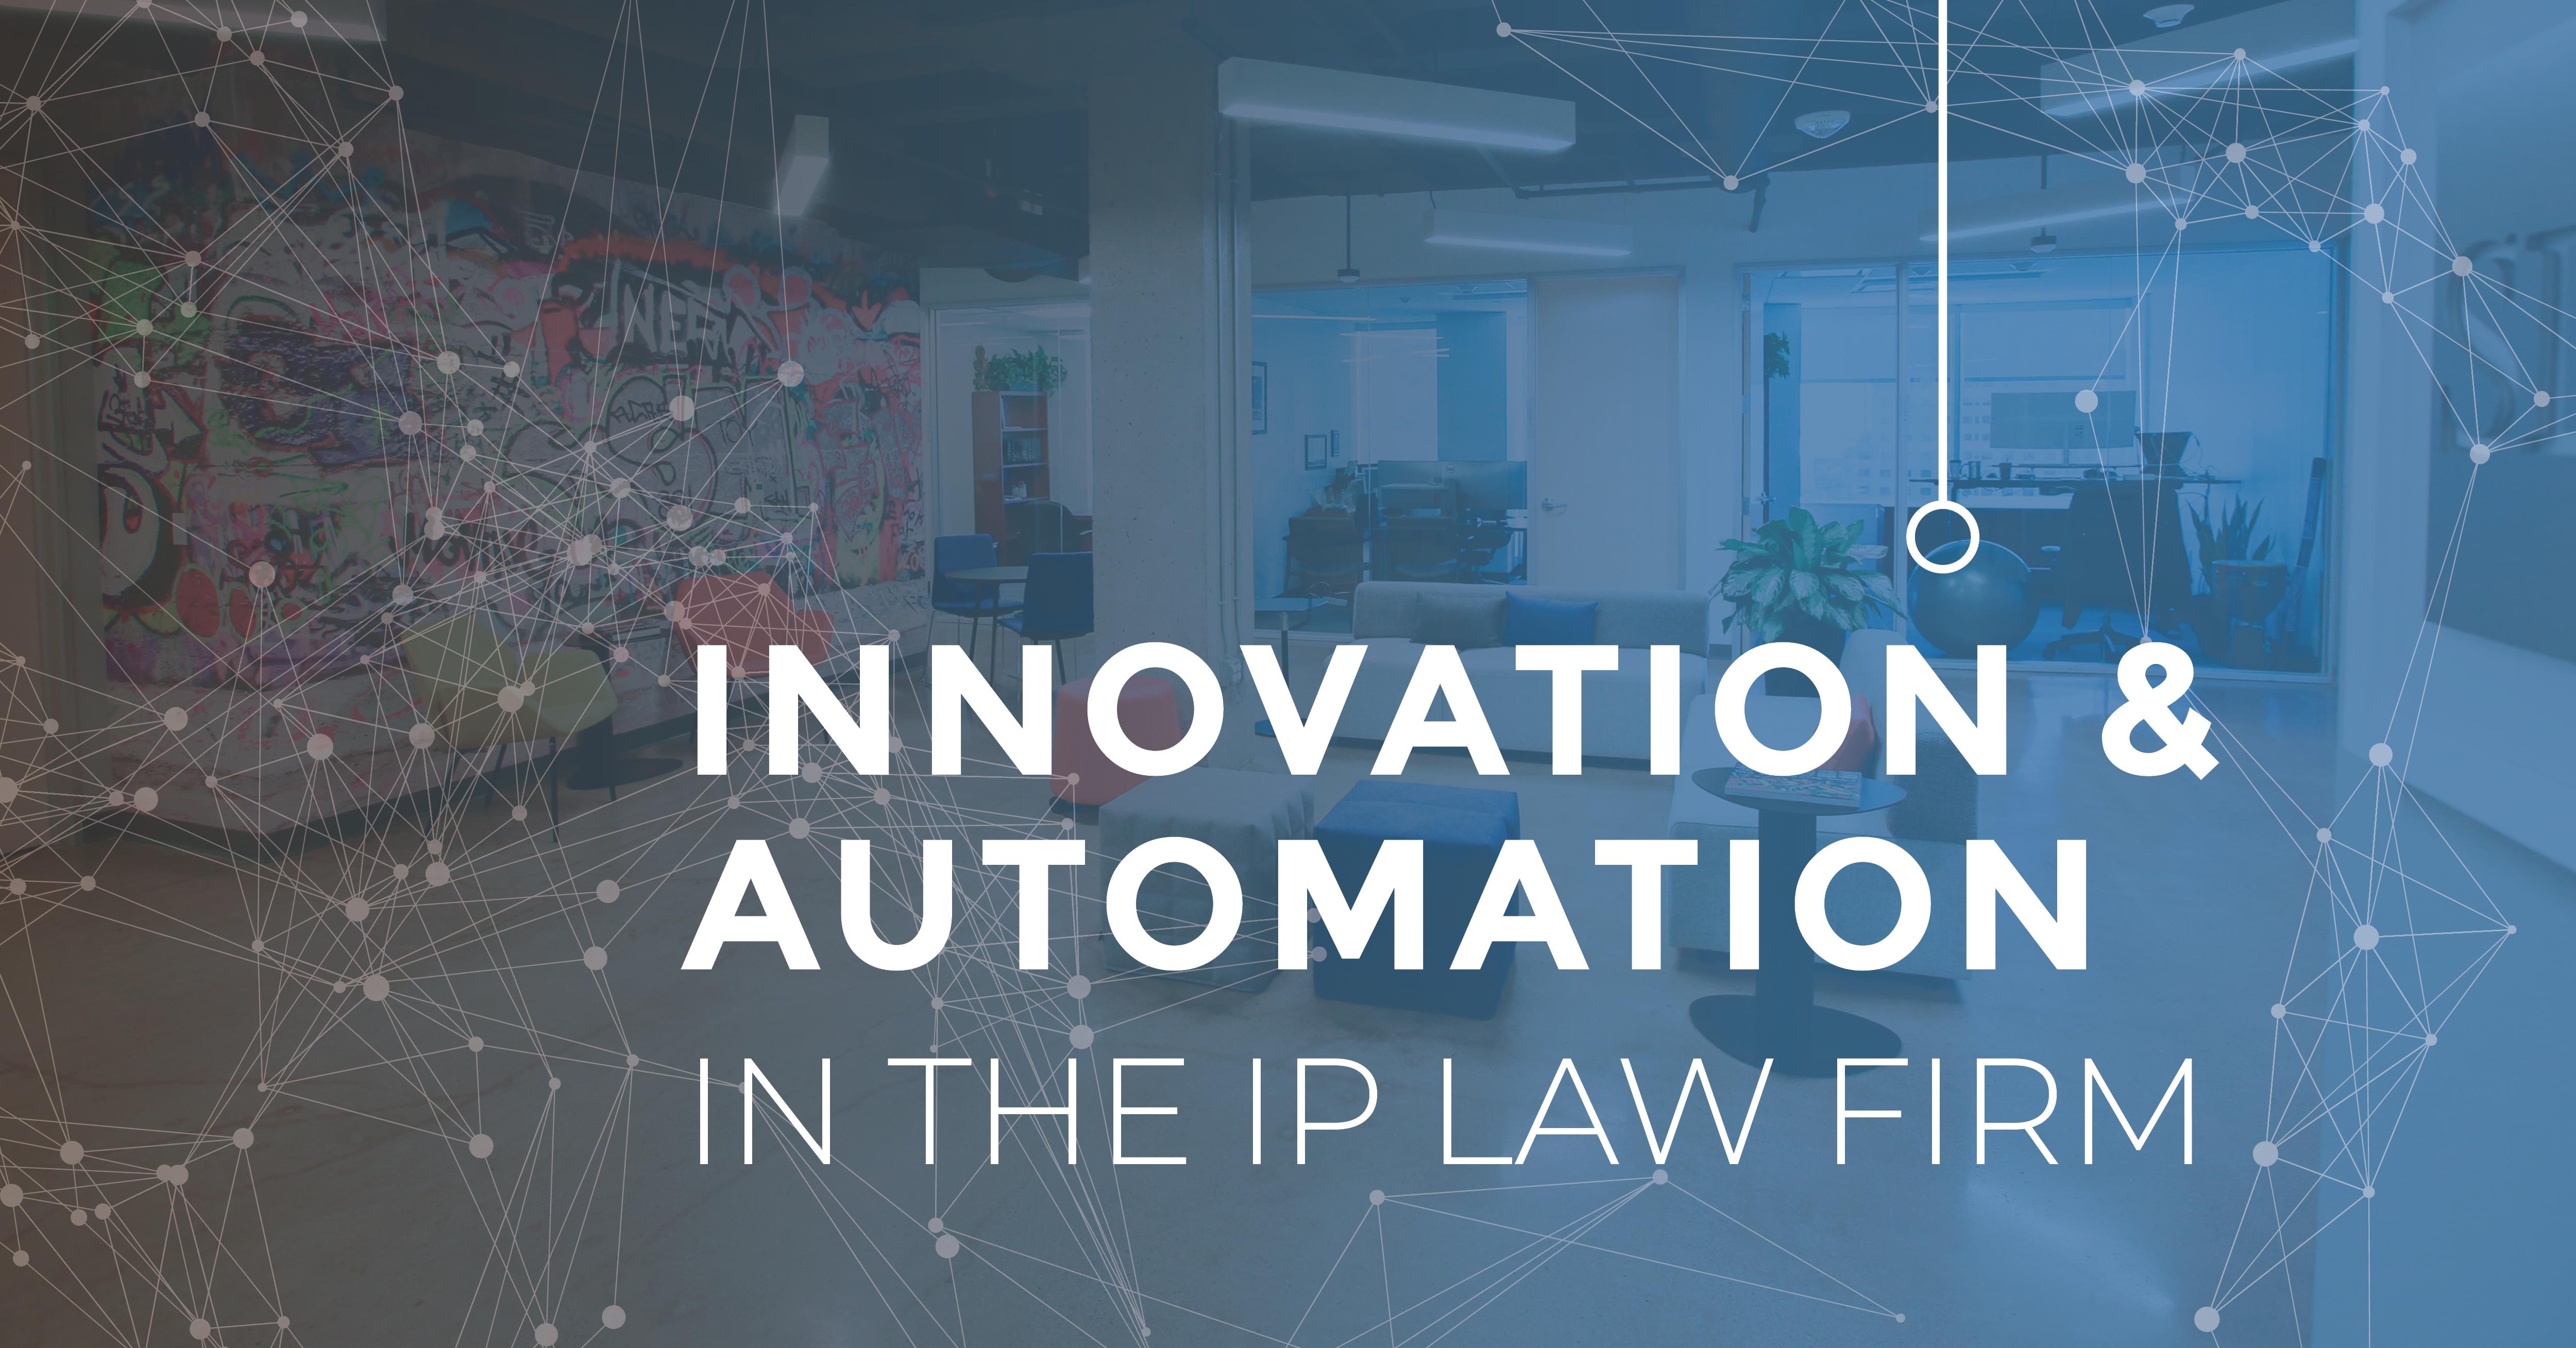 Innovation & Automation 2